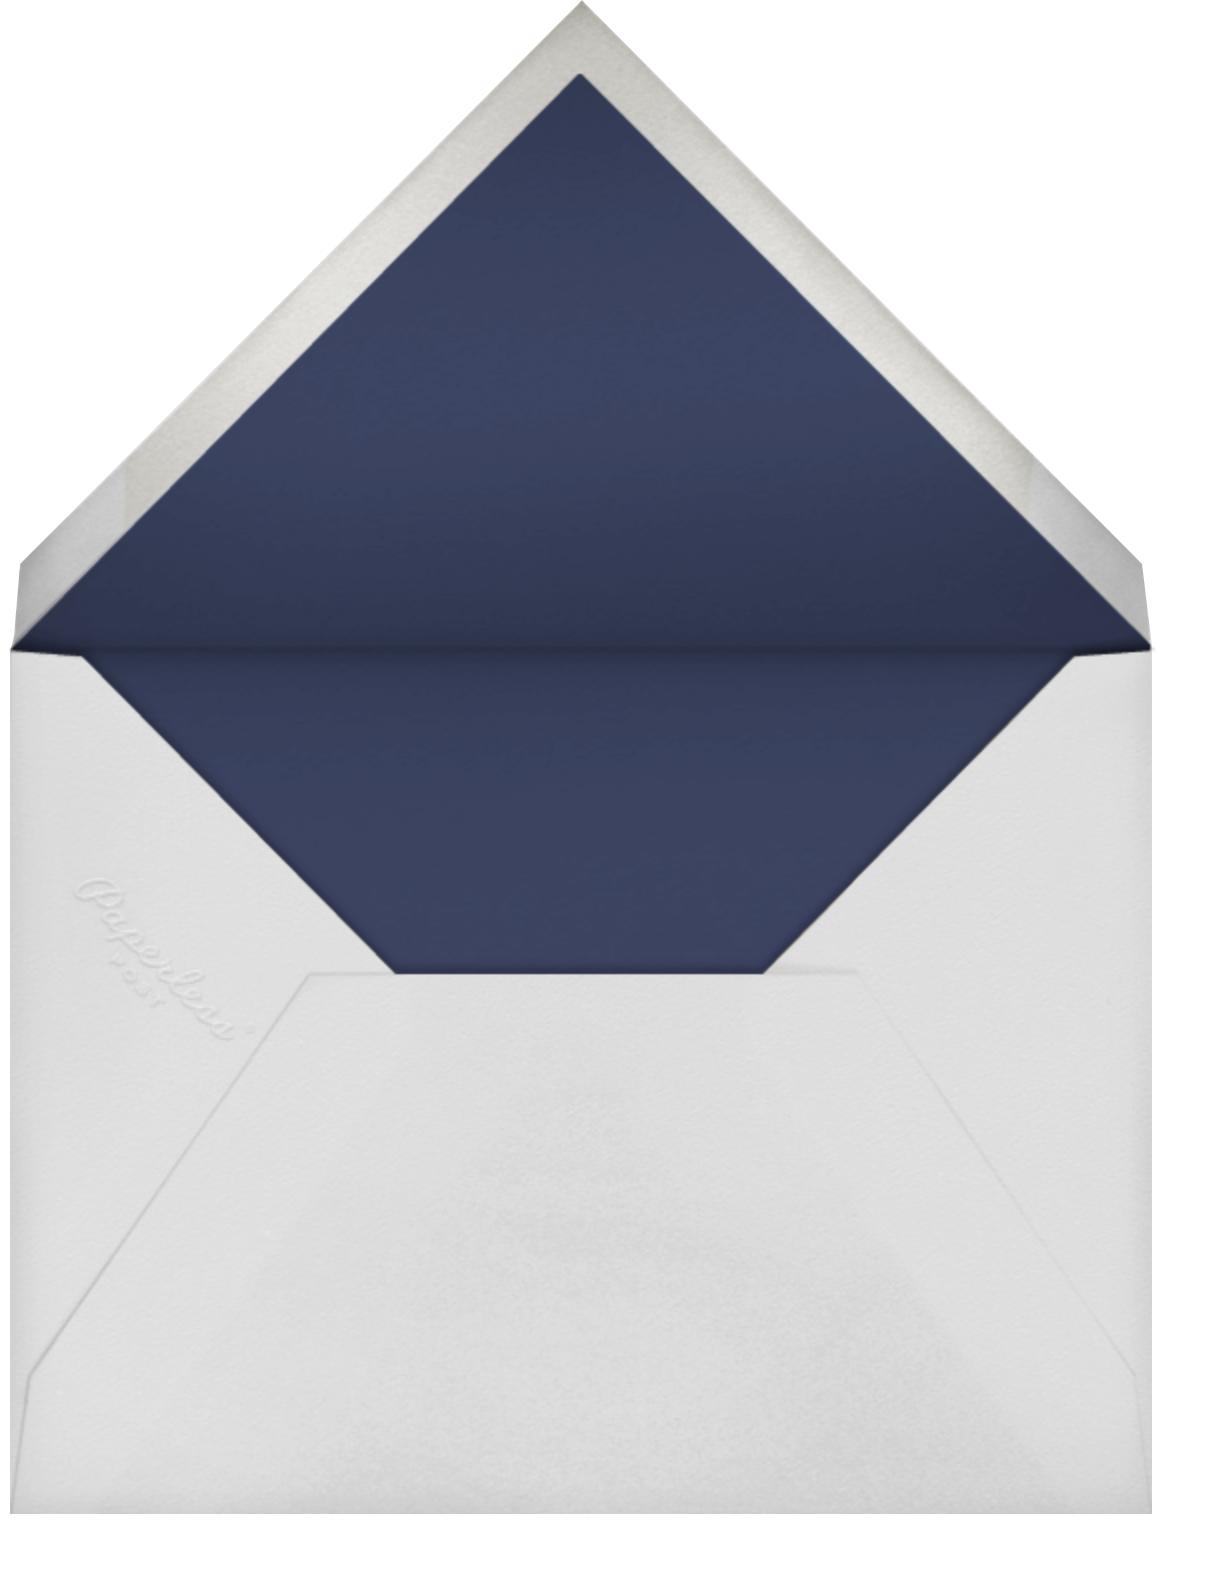 Tabernacle - Pearl White - Paperless Post - Hanukkah - envelope back